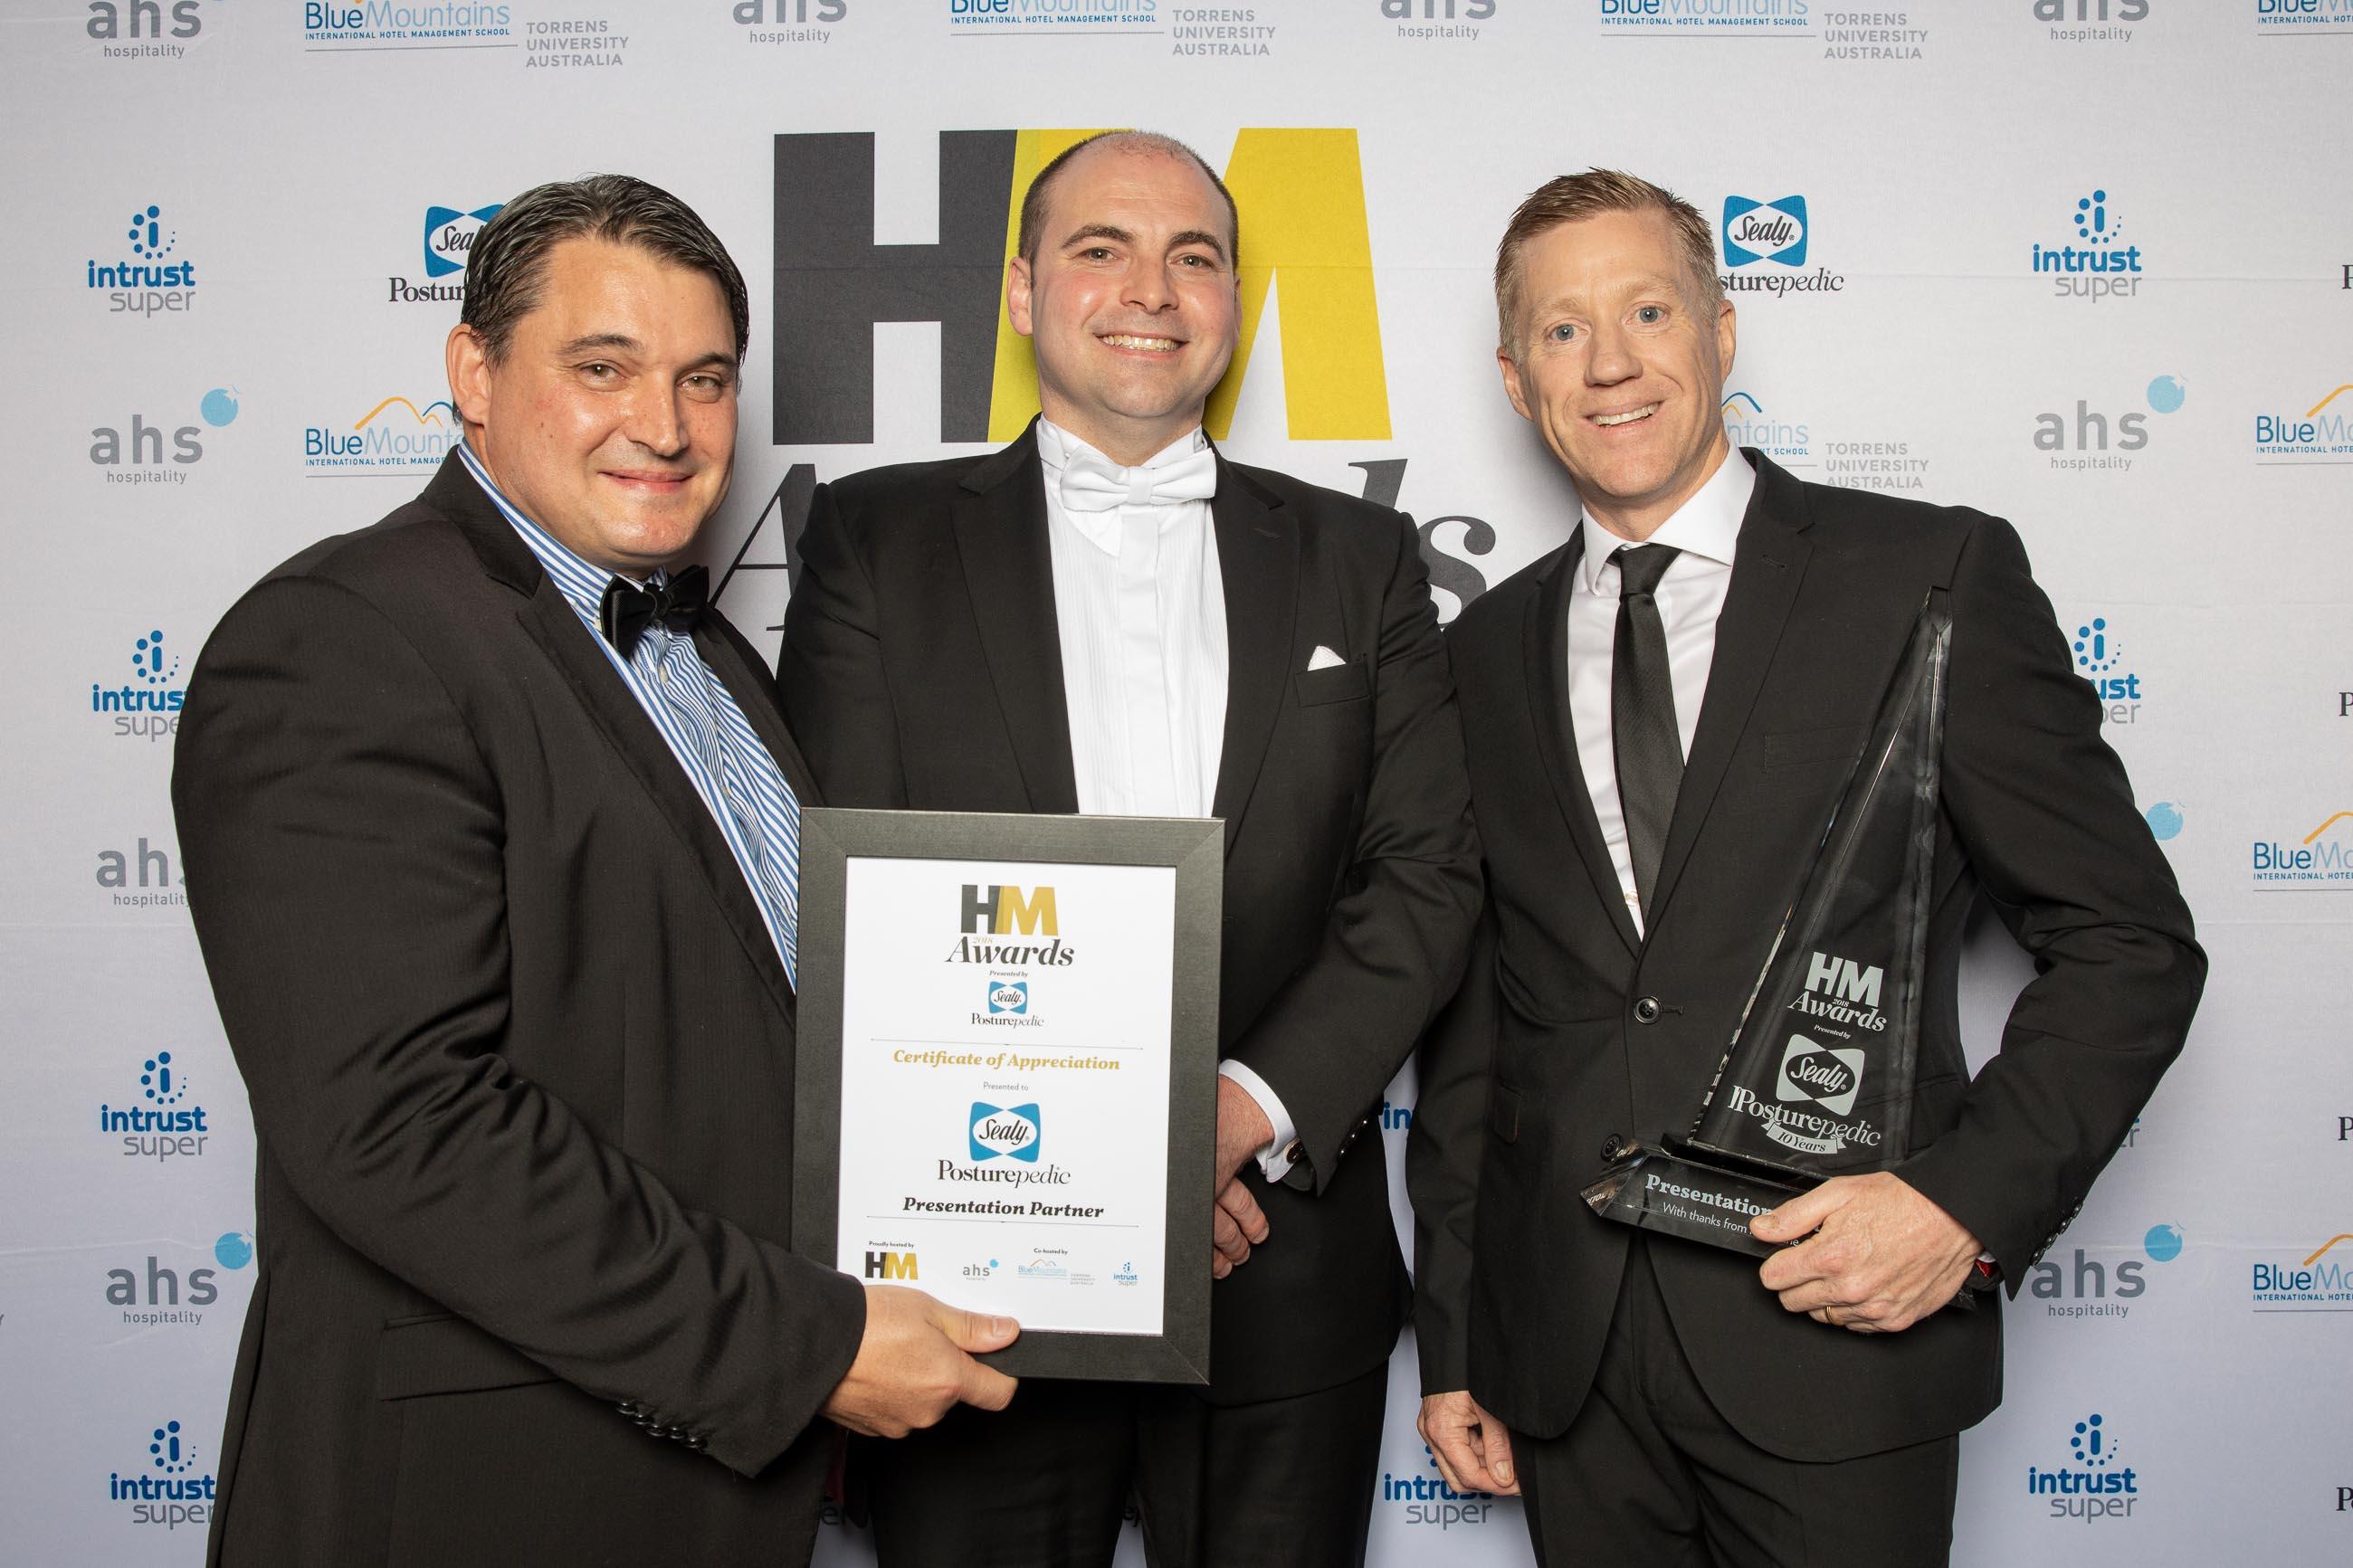 HM's Adam Daff presents Sealy with the sponsirshipo award